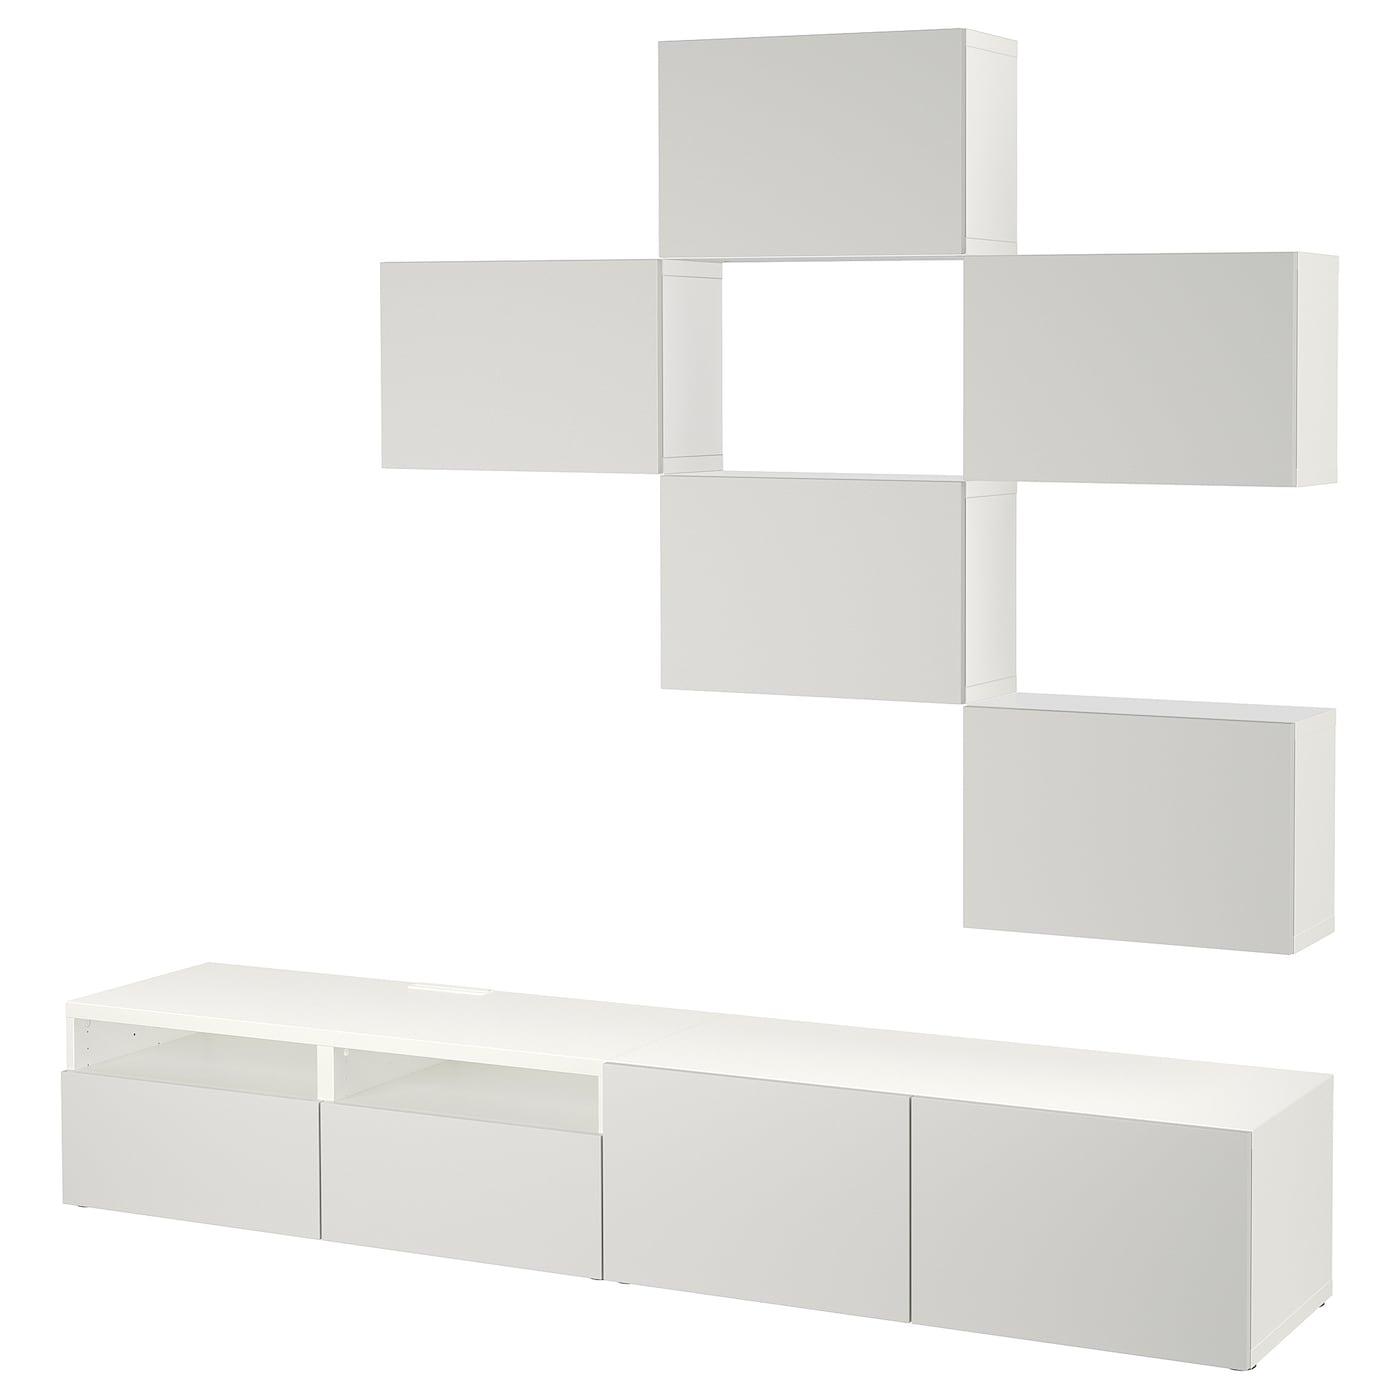 Best mueble tv con almacenaje blanco lappviken gris claro 240 x 20 40 x 204 cm ikea - Muebles almacenaje ikea ...